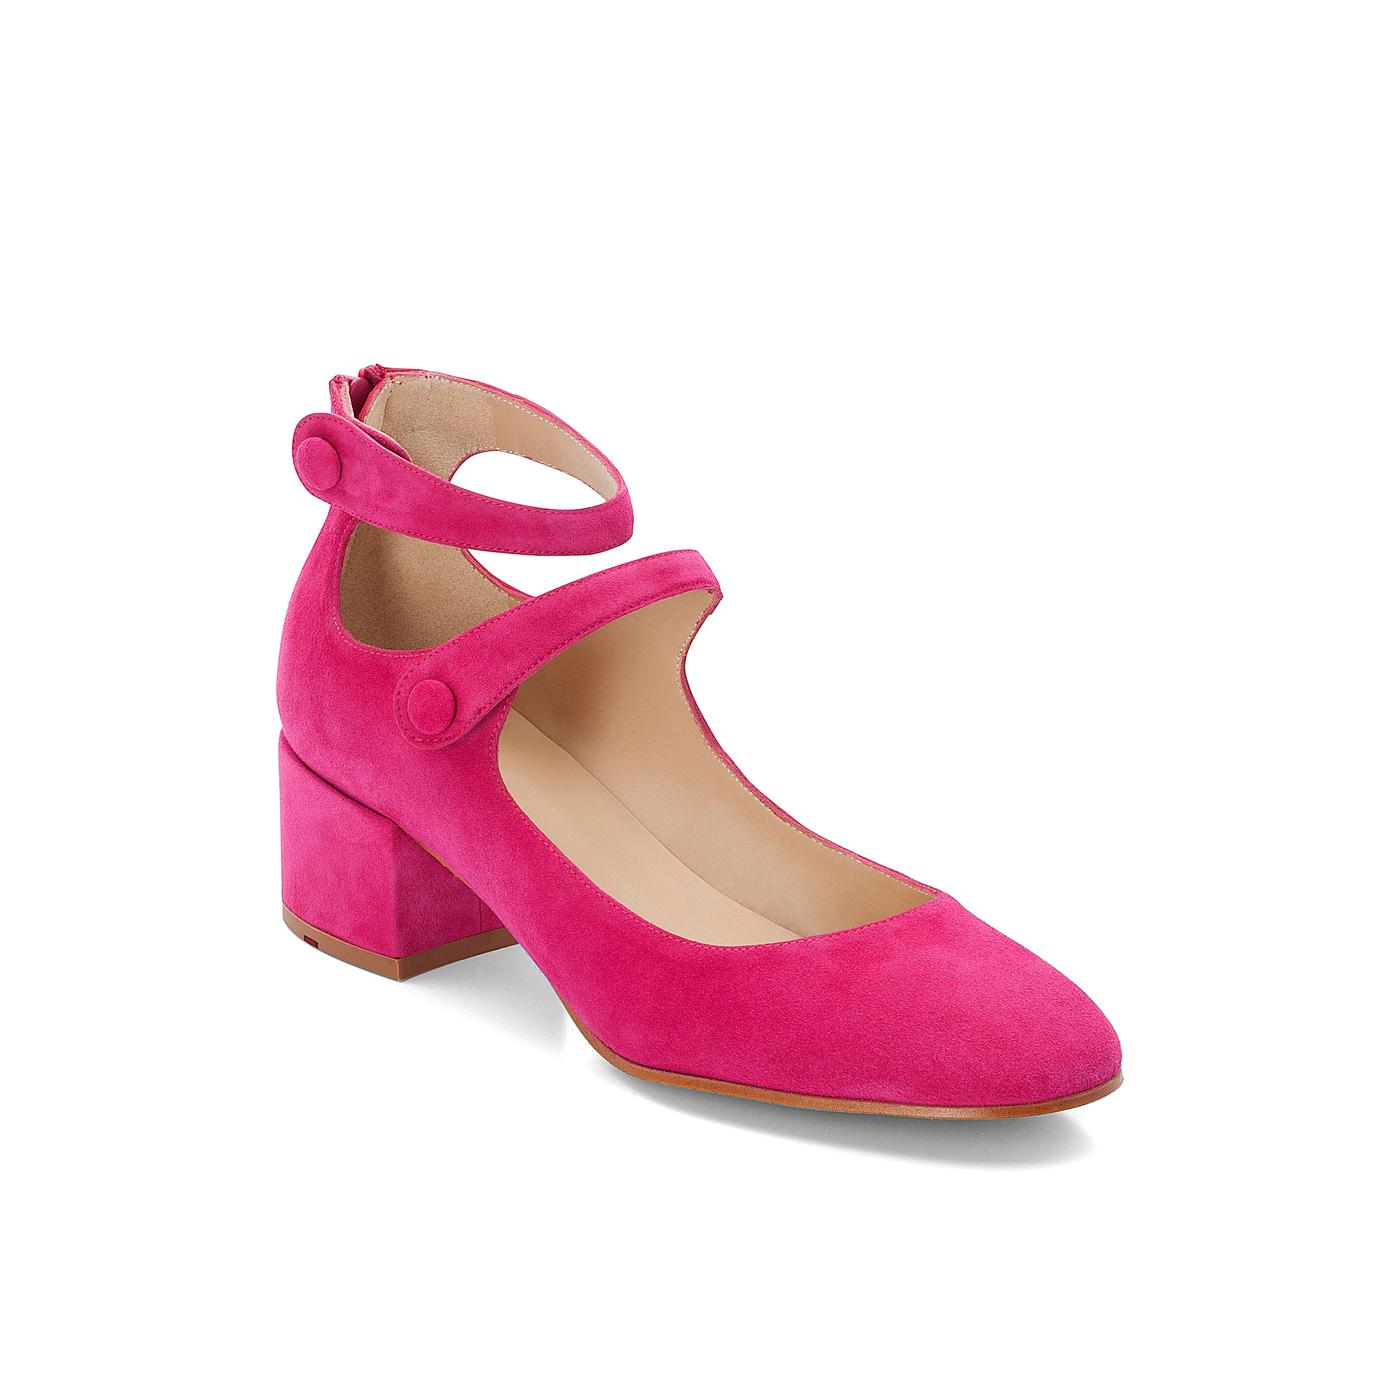 PUMPS | Schuhe > Pumps | Pink | LLOYD